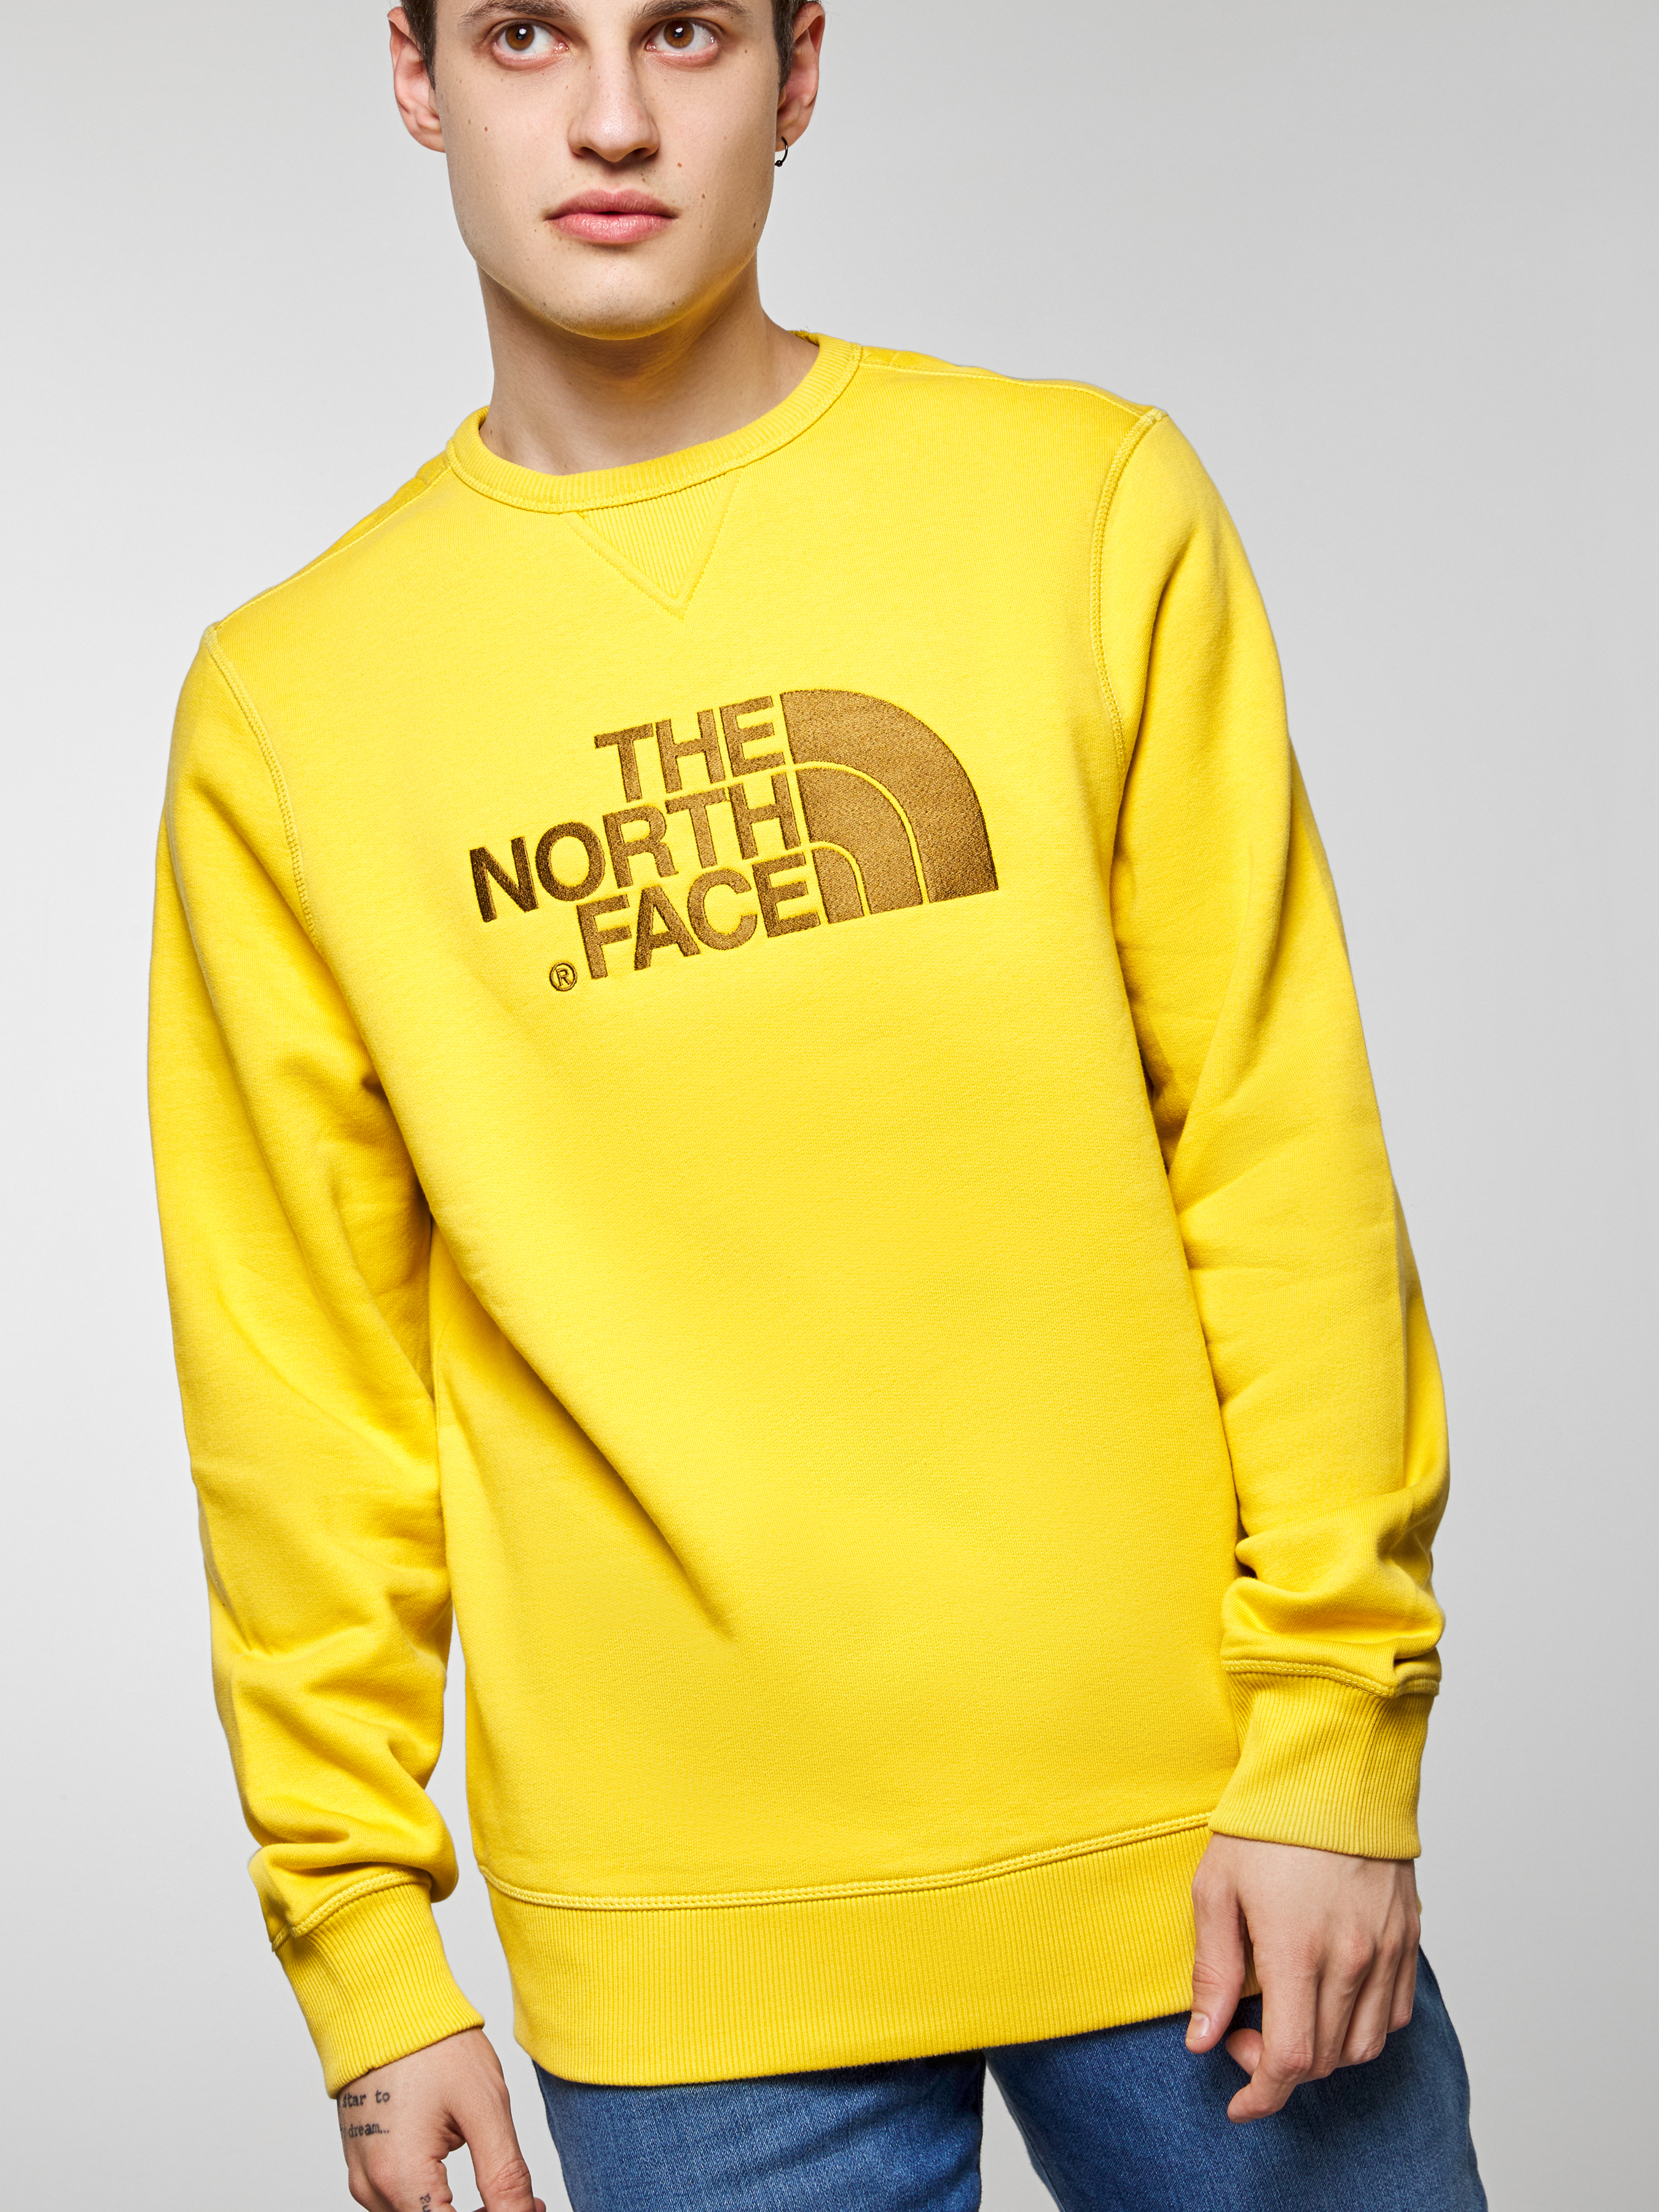 Кофты и свитера мужские The North Face модель NF0A2ZWRZBJ1 цена, 2017